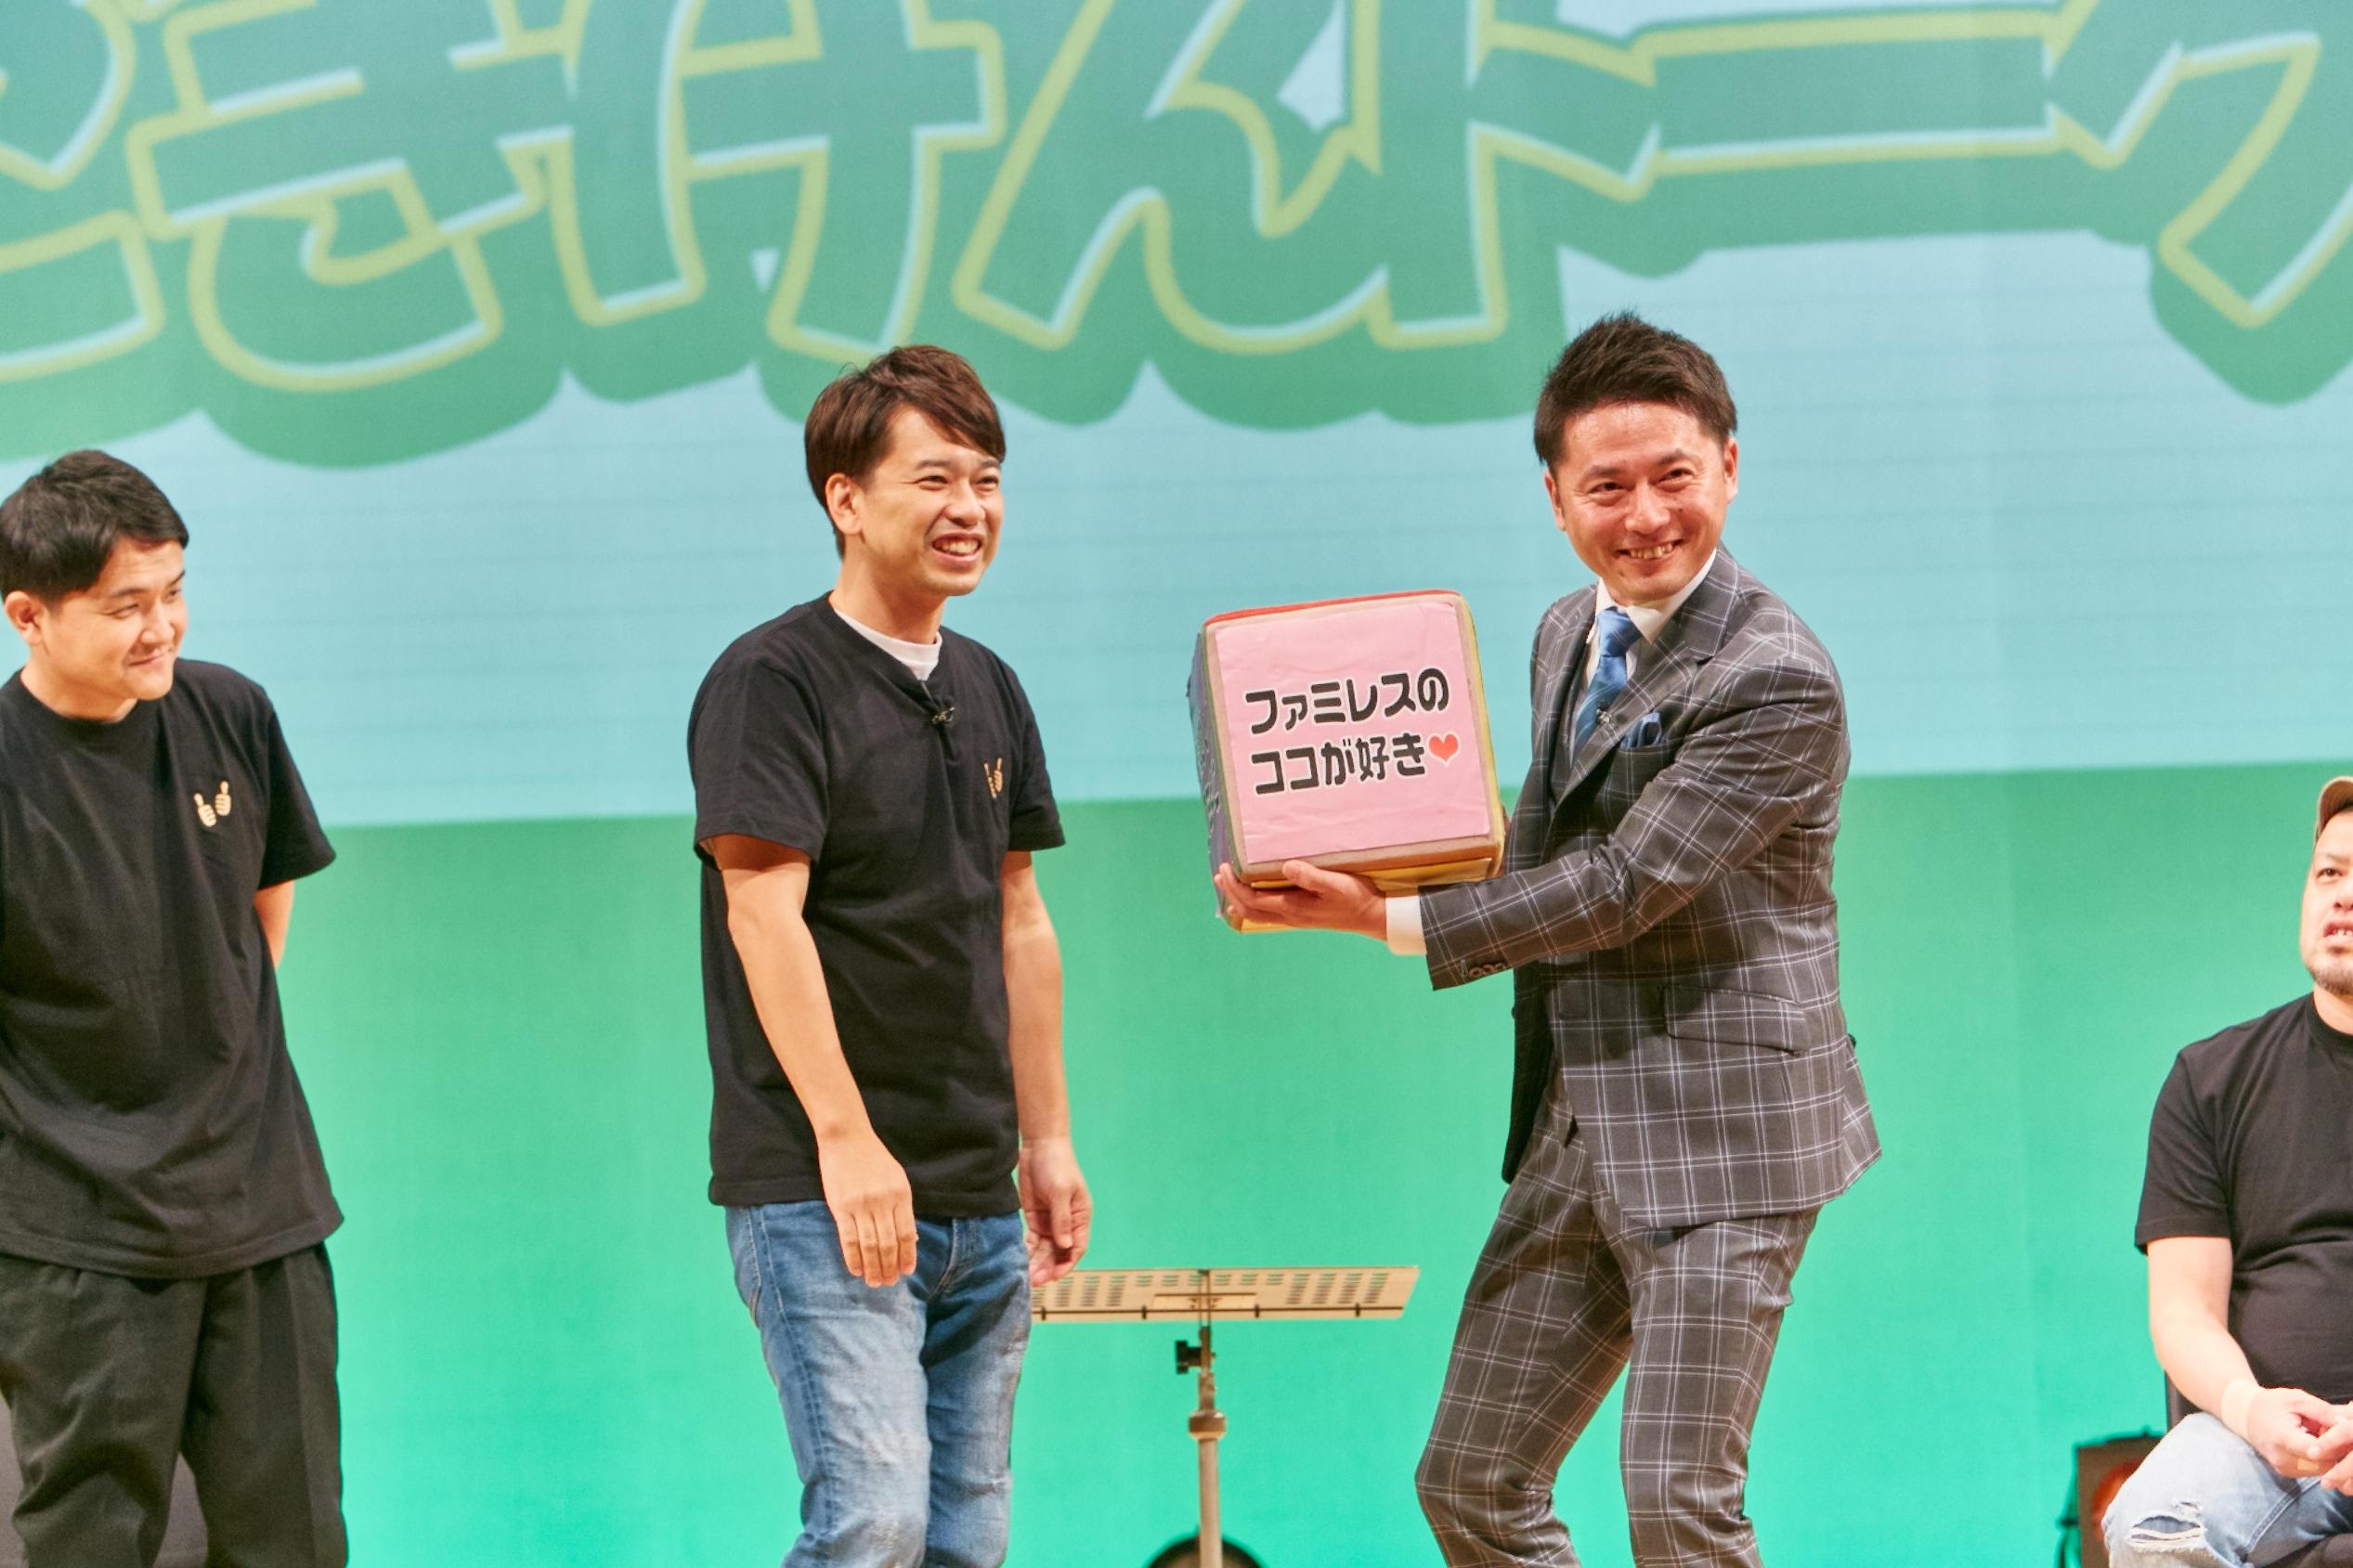 http://news.yoshimoto.co.jp/20171113161849-d5fdf379718169fd8b8412105e409e664ed1cb96.jpg